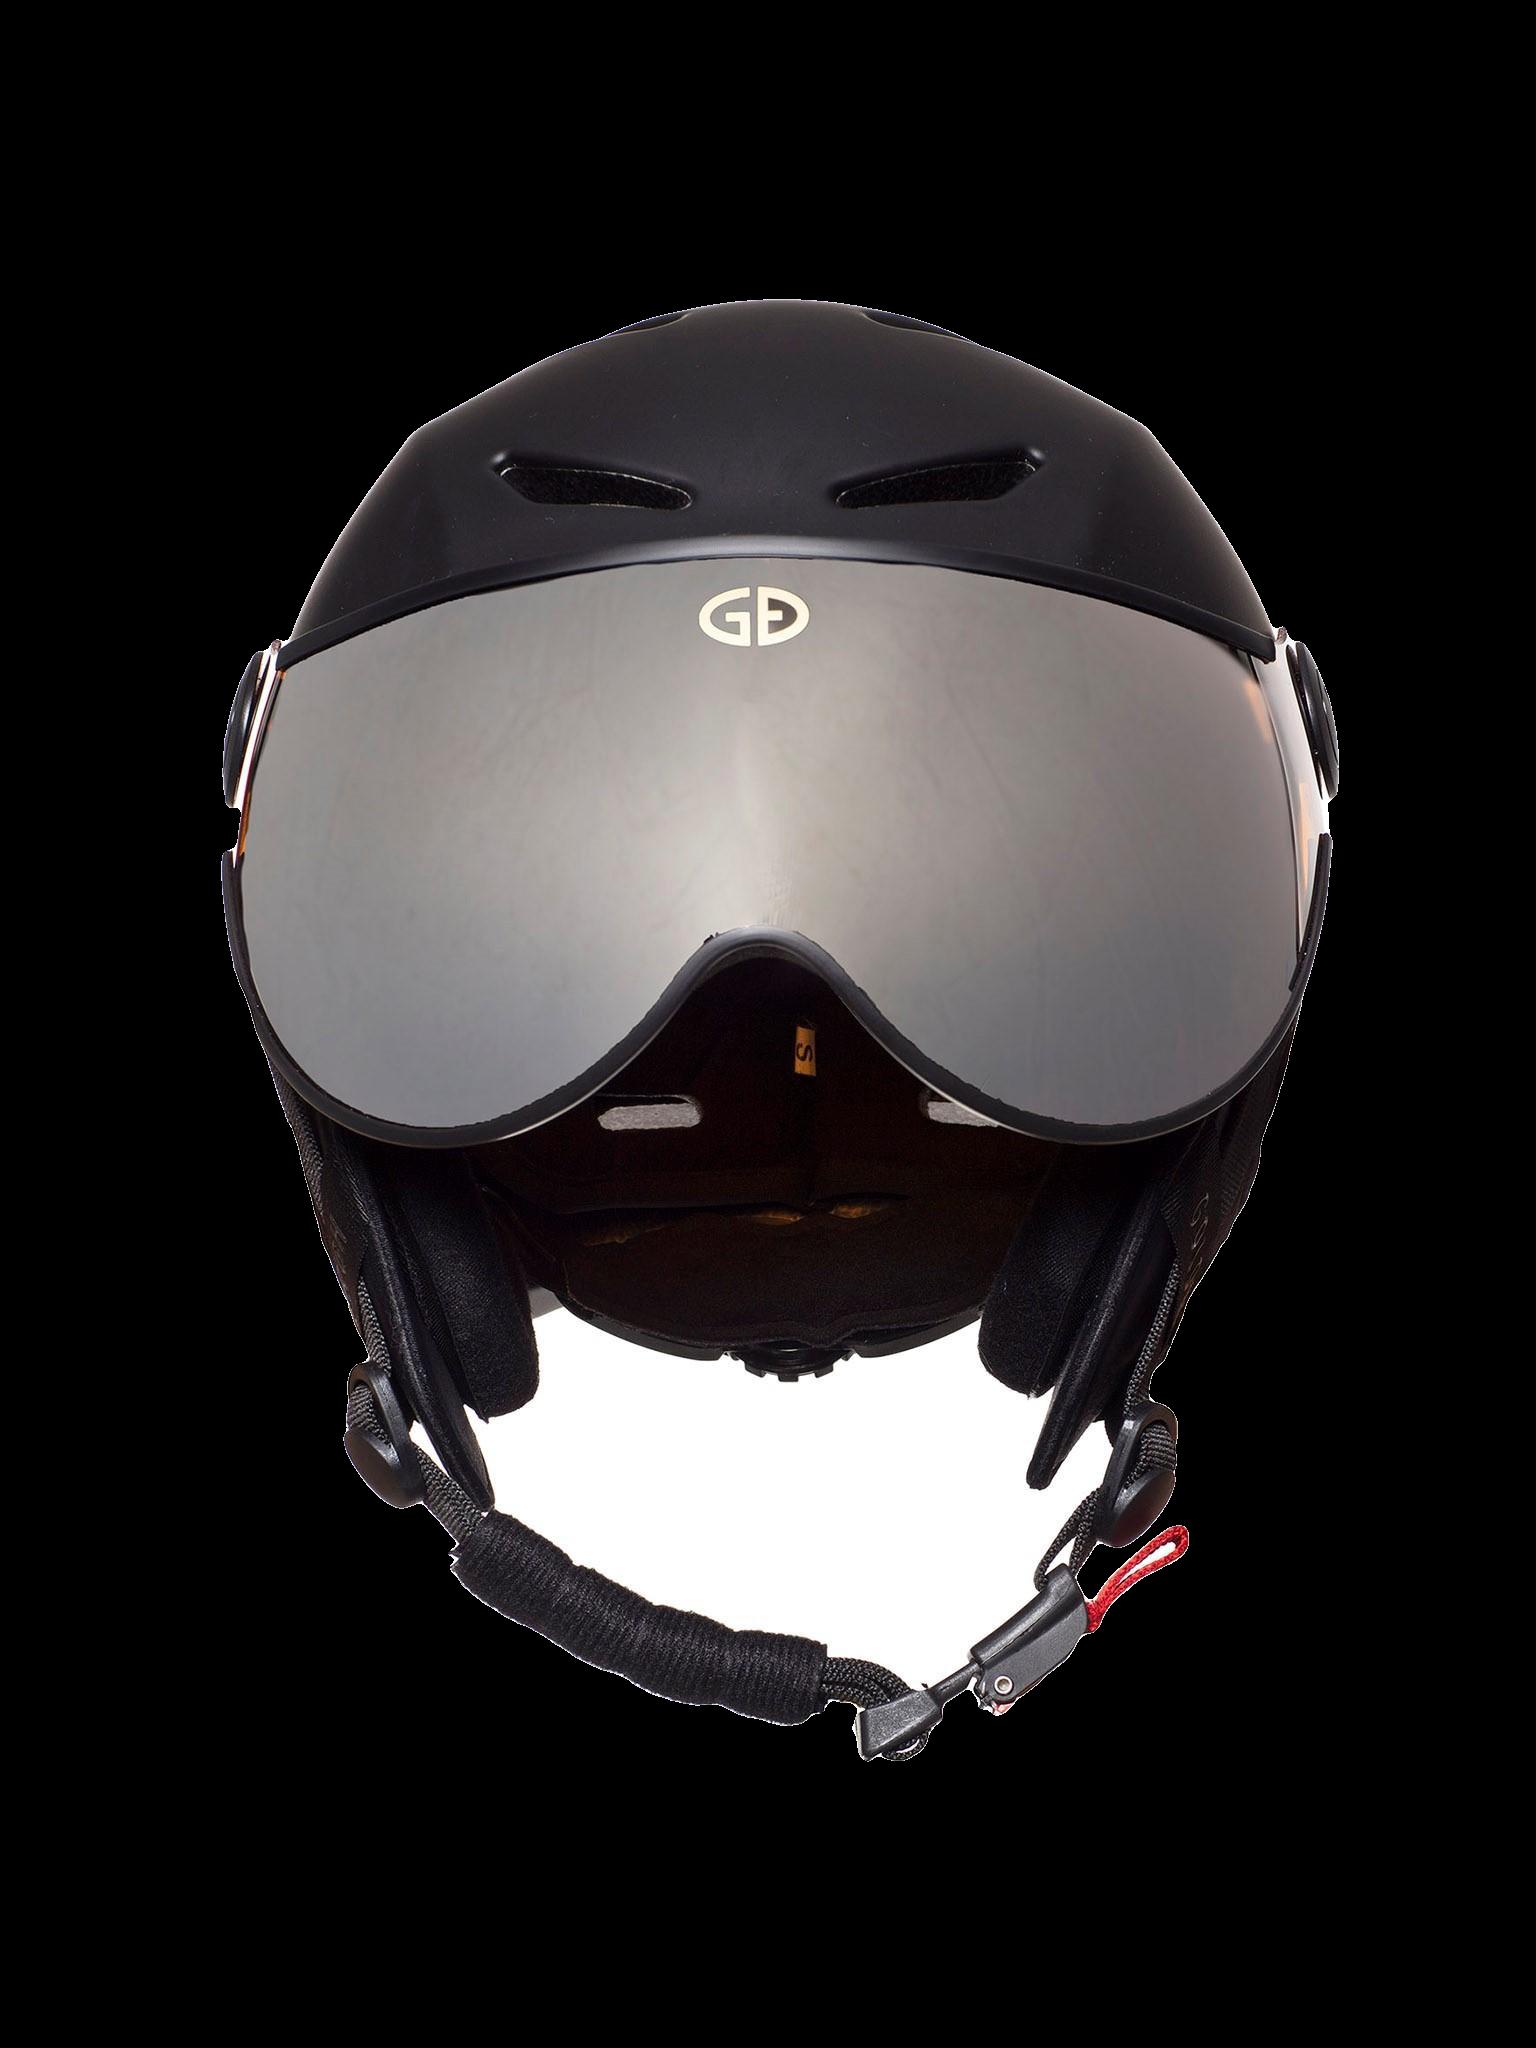 Goldbergh Angel Ski Helmet - Skihelm - Damen